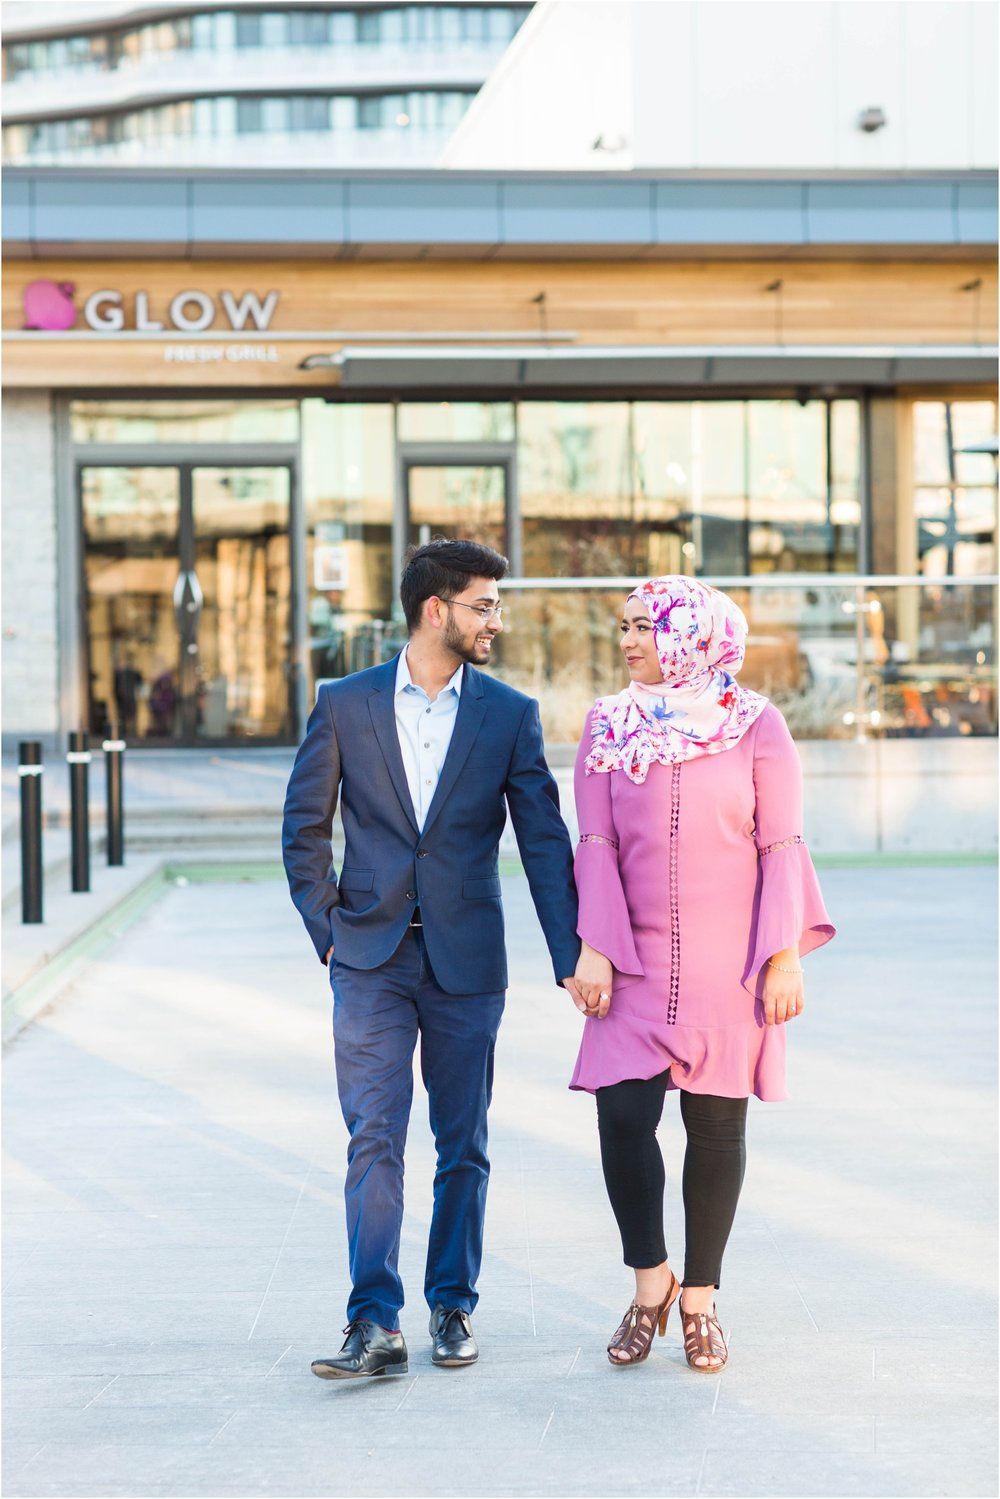 Shops-at-Don-Mills-Engagement-Session-Toronto-Mississauga-Brampton-Scarborough-GTA-Pakistani-Indian-Wedding-Engagement-Photographer-Photography_0024.jpg